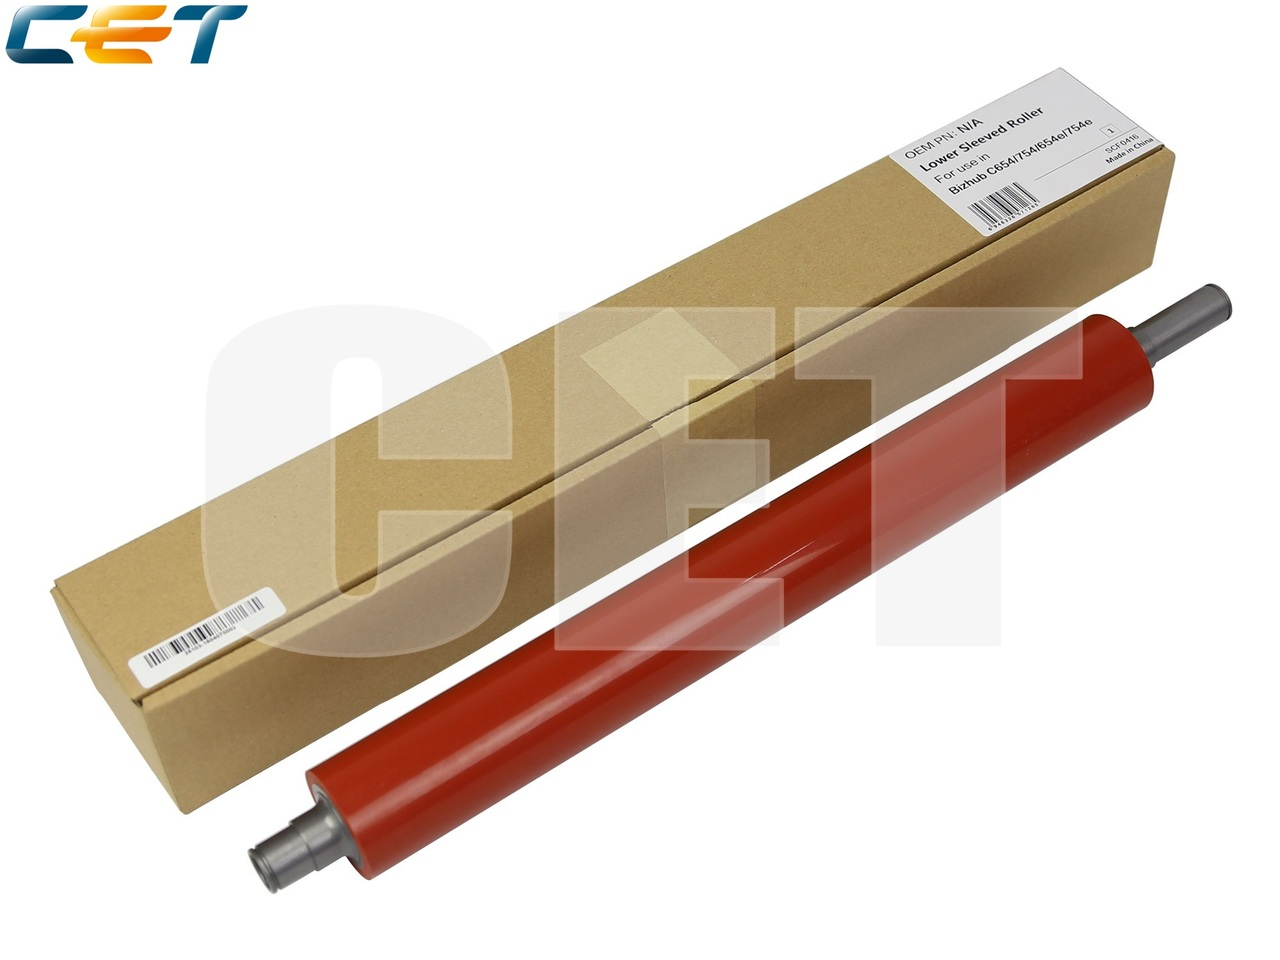 Резиновый вал для KONICA MINOLTA Bizhub654/754/654e/754e/C654/C754/C654e/C754e (CET), CET7126